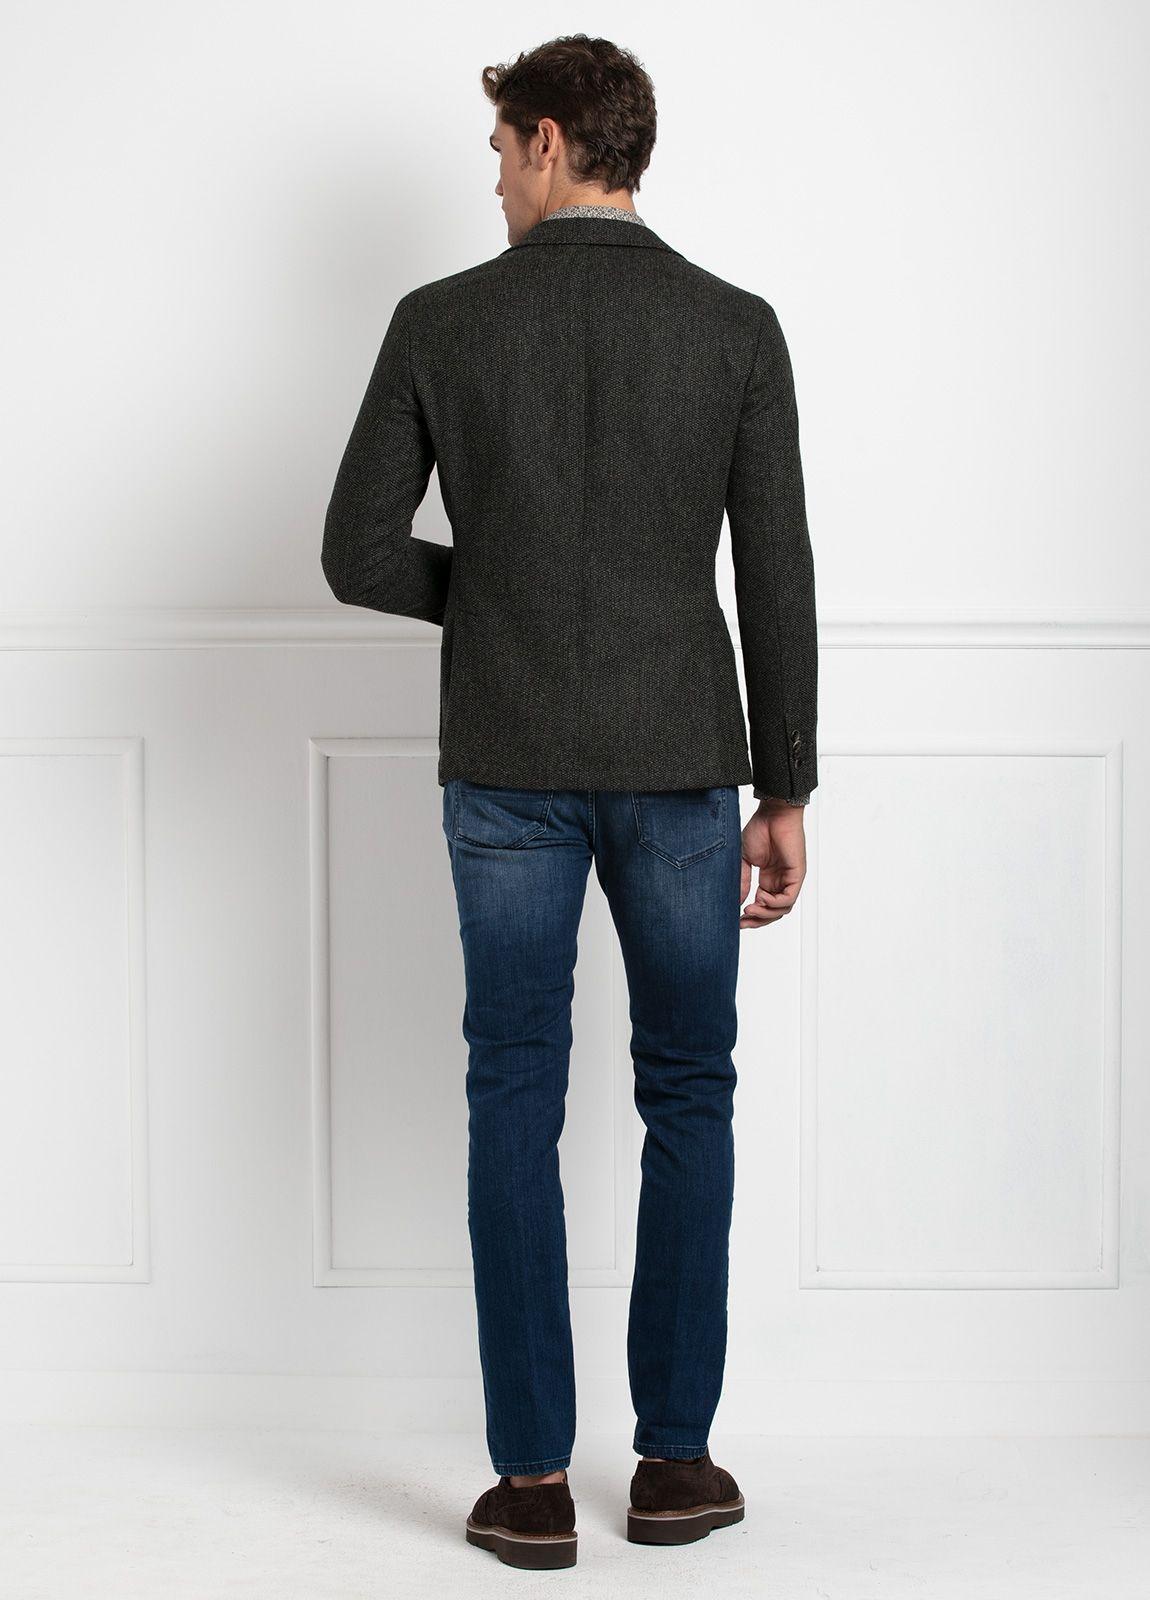 Americana SOFT JACKET Slim Fit, tejido textura color verde oscuro. 97% Lana, 3% Cashmere. - Ítem3